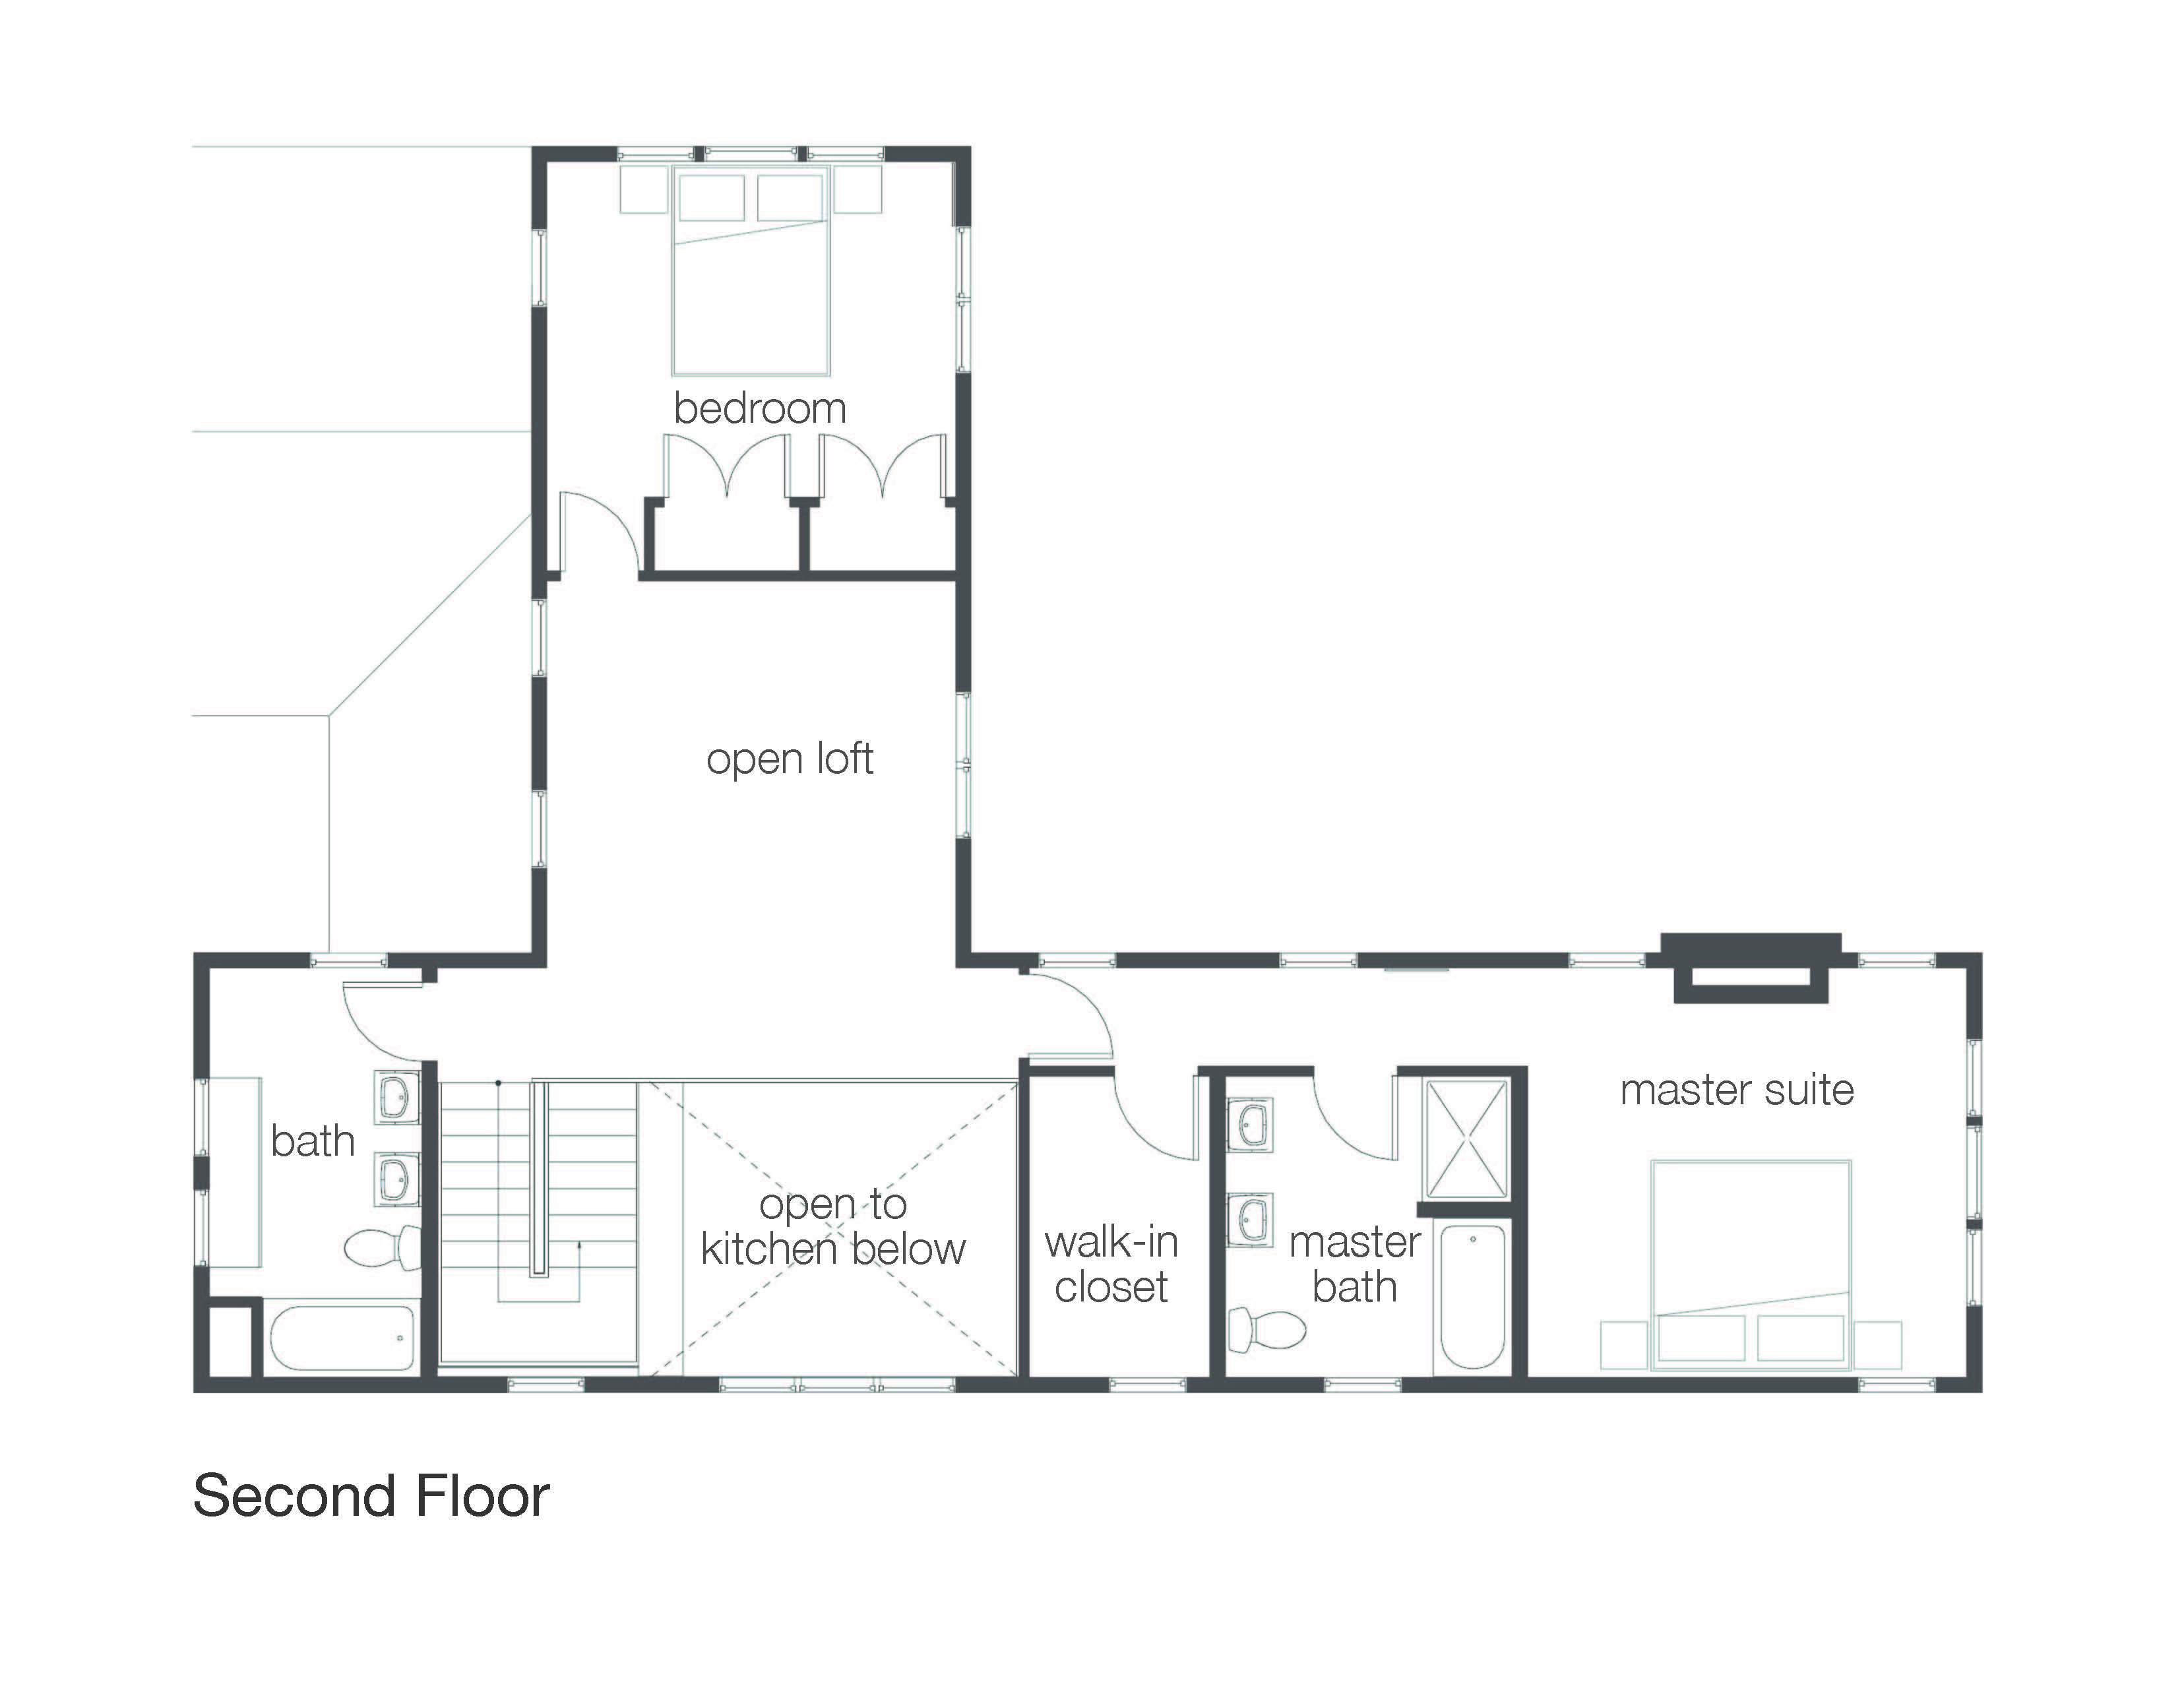 Unique leed house plans house floor ideas for Leed house plans